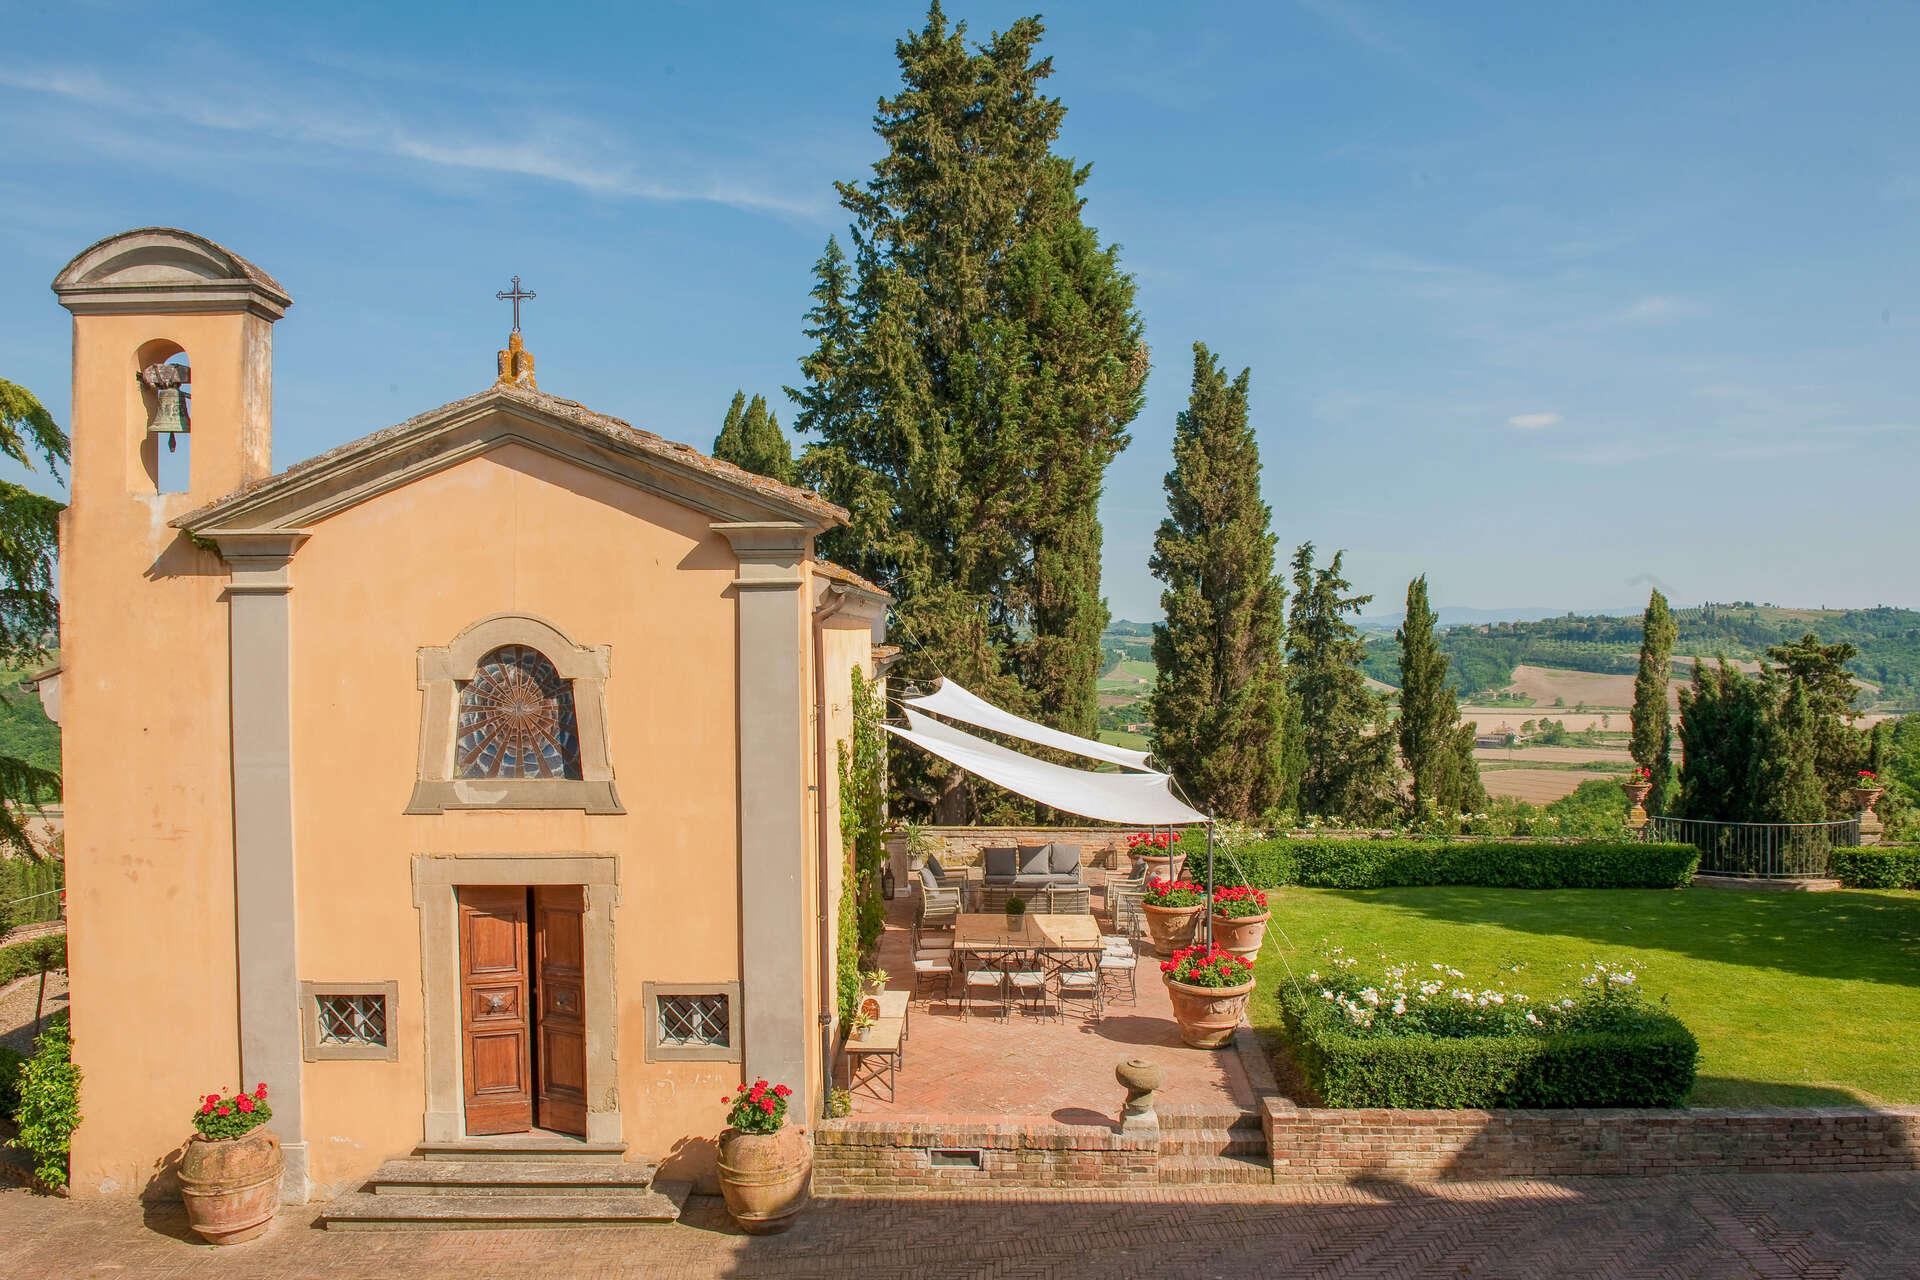 Luxury vacation rentals europe - Italy - Tuscany - Palazzo - Image 1/31